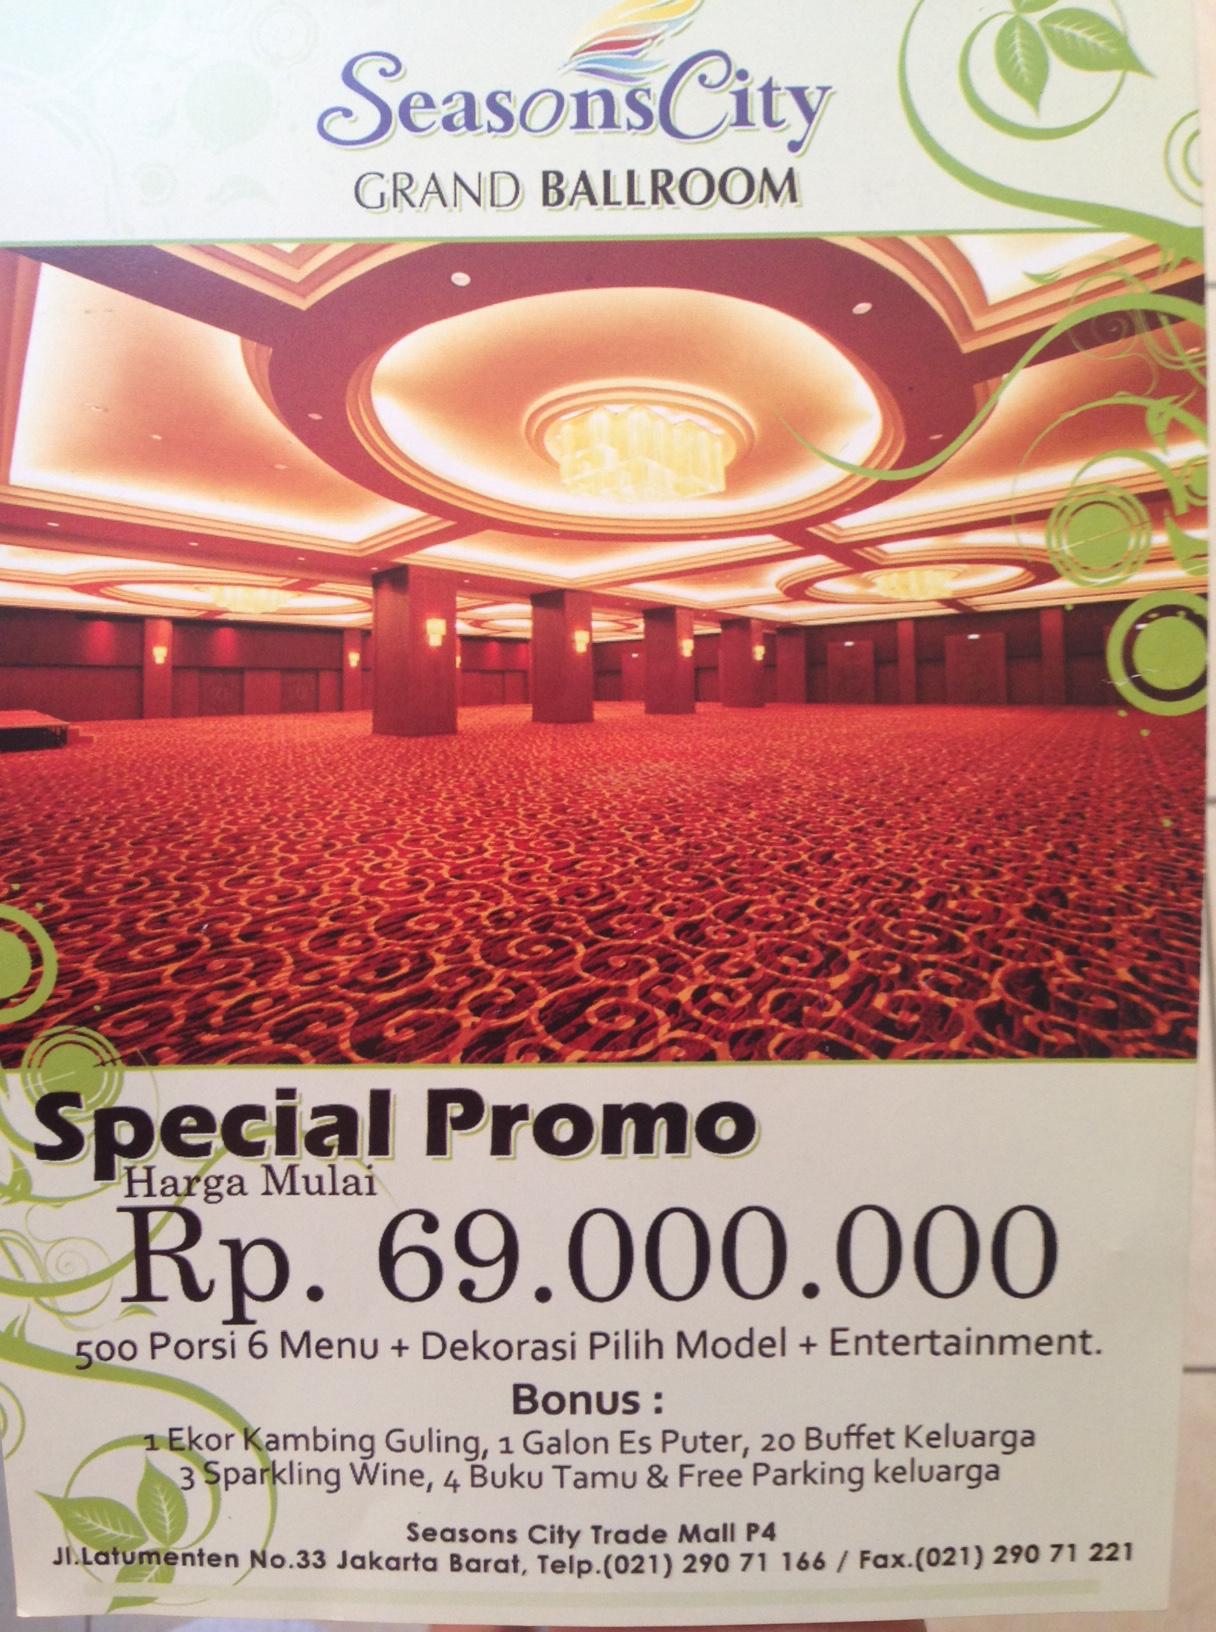 Paket Wedding Hotel Jakarta 2018 : paket, wedding, hotel, jakarta, Wedding, Venue, Hunting, Littlemissindri